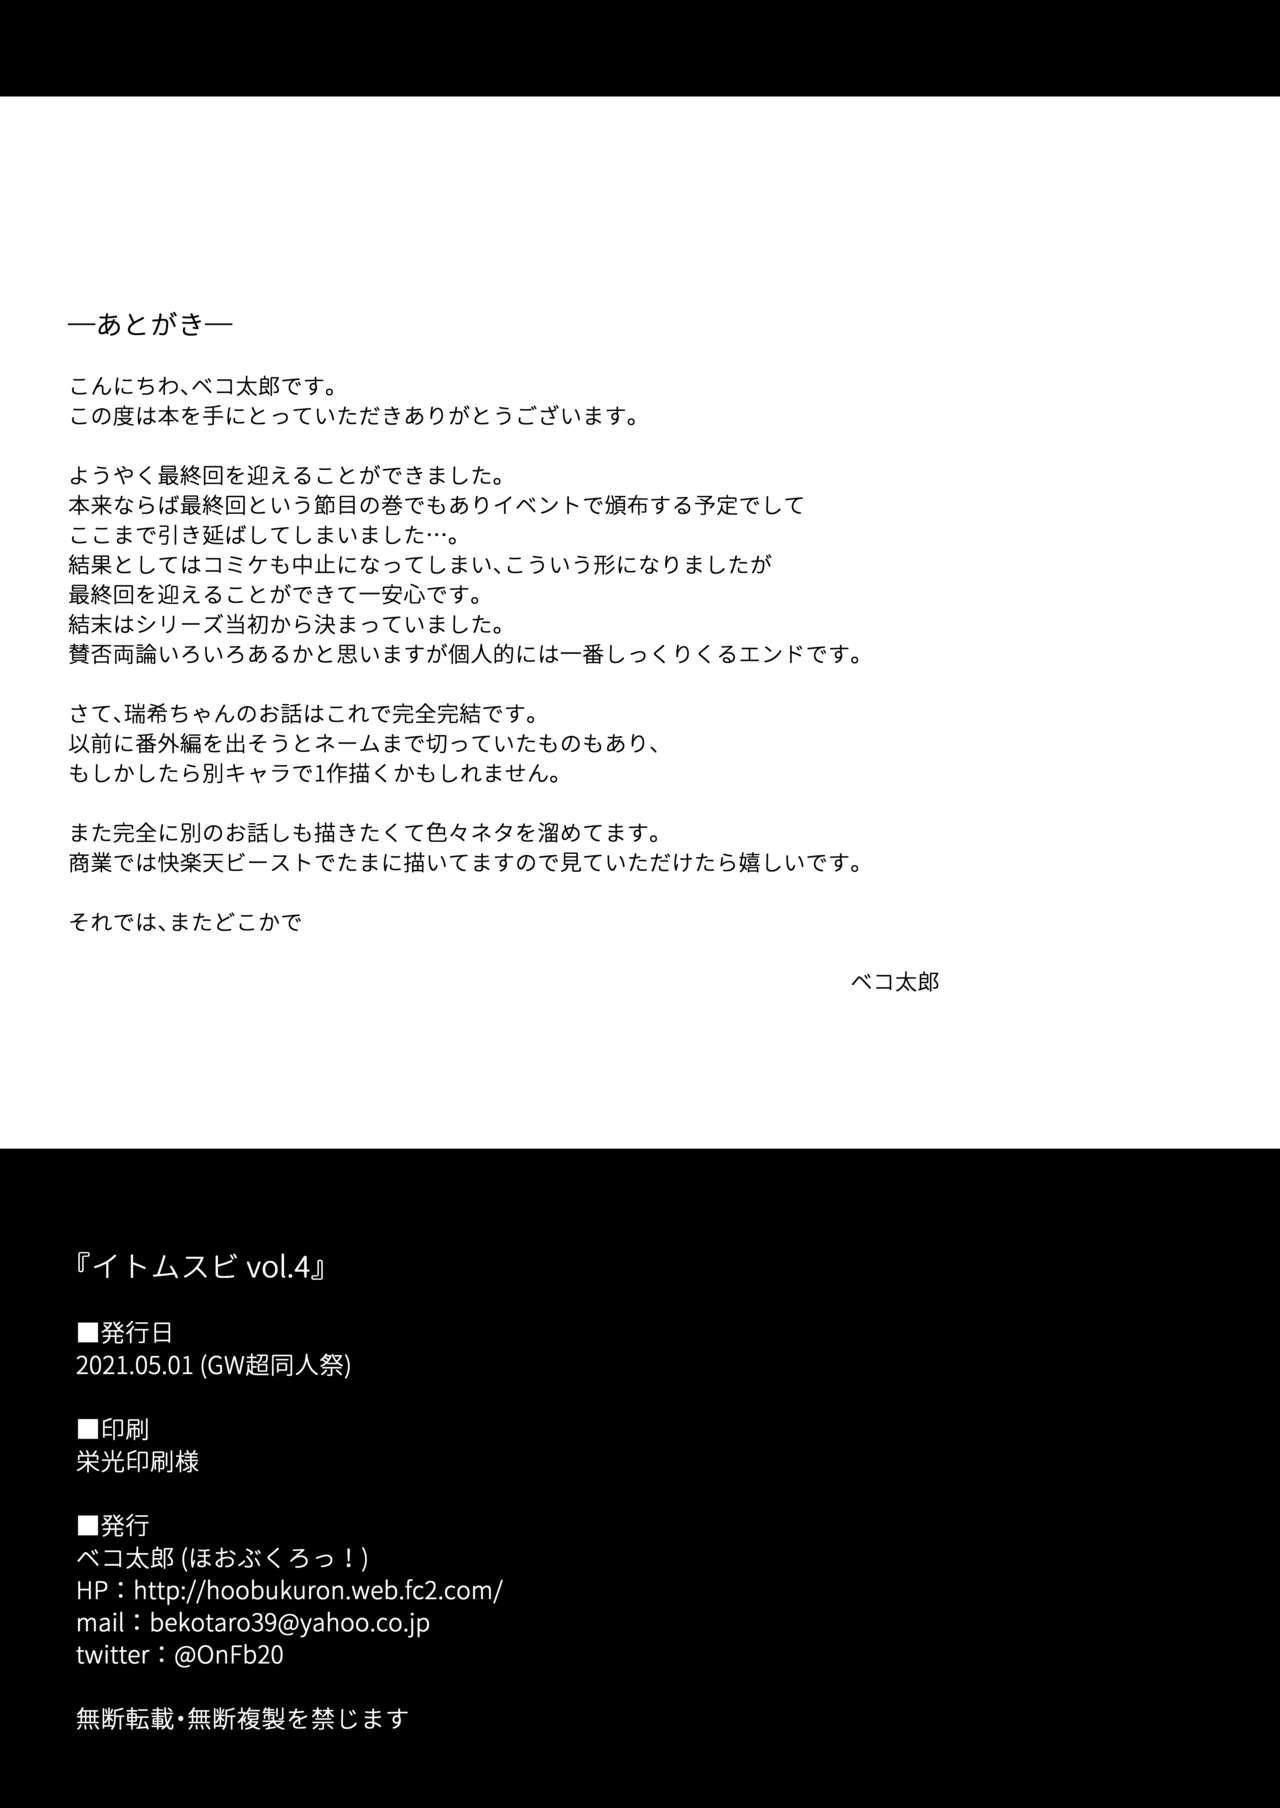 Itomusubi Vol. 4 44